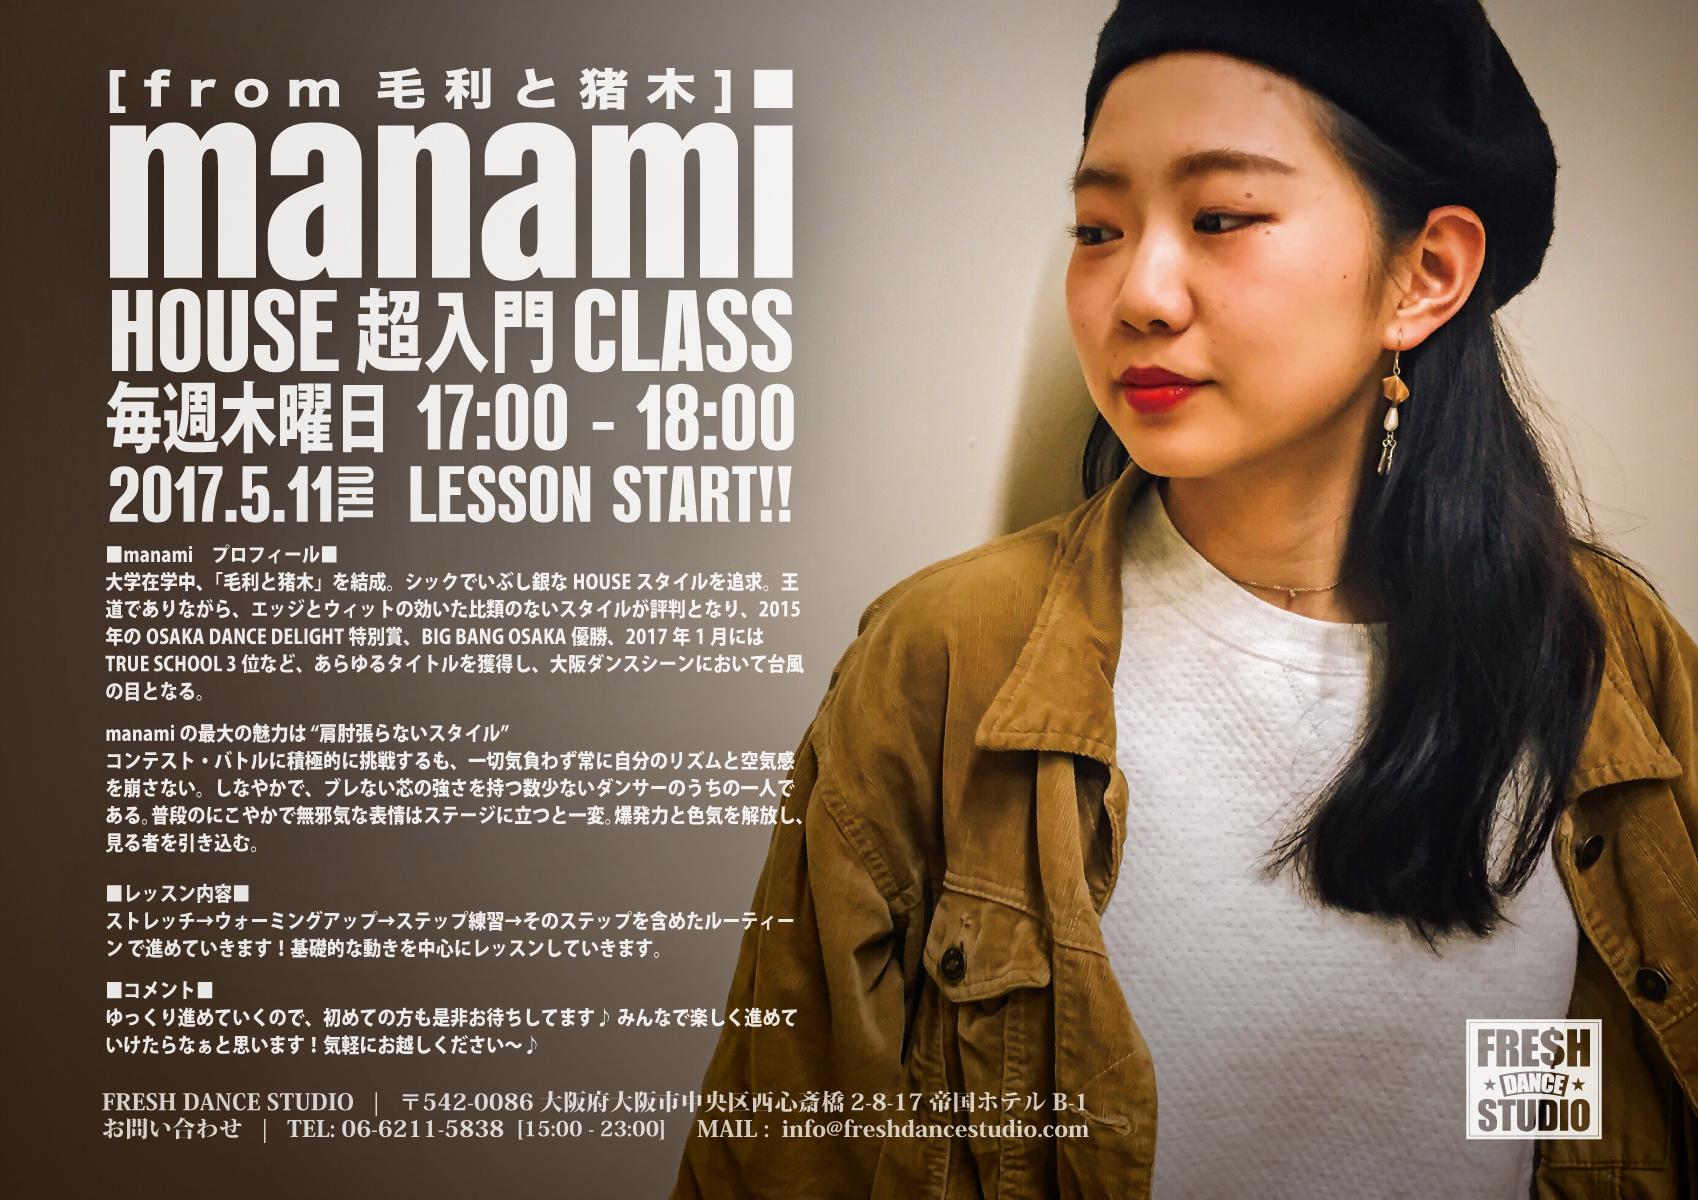 minami-pop-A4-01